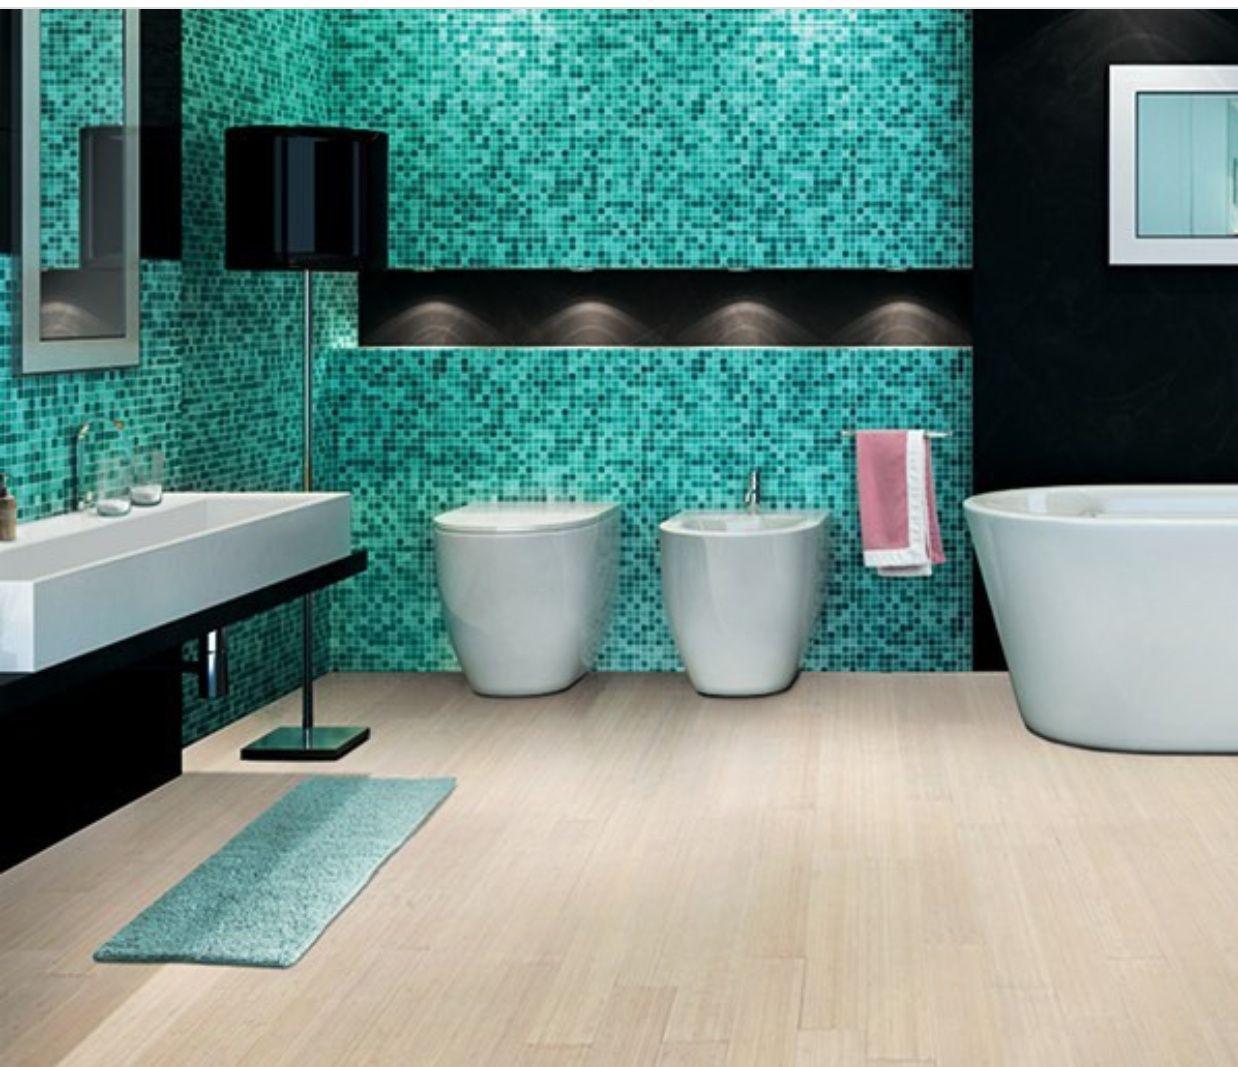 Bathroom Tiels Mosaic Leroymerlin Mosaic Bathroom Home Decor Bathroom